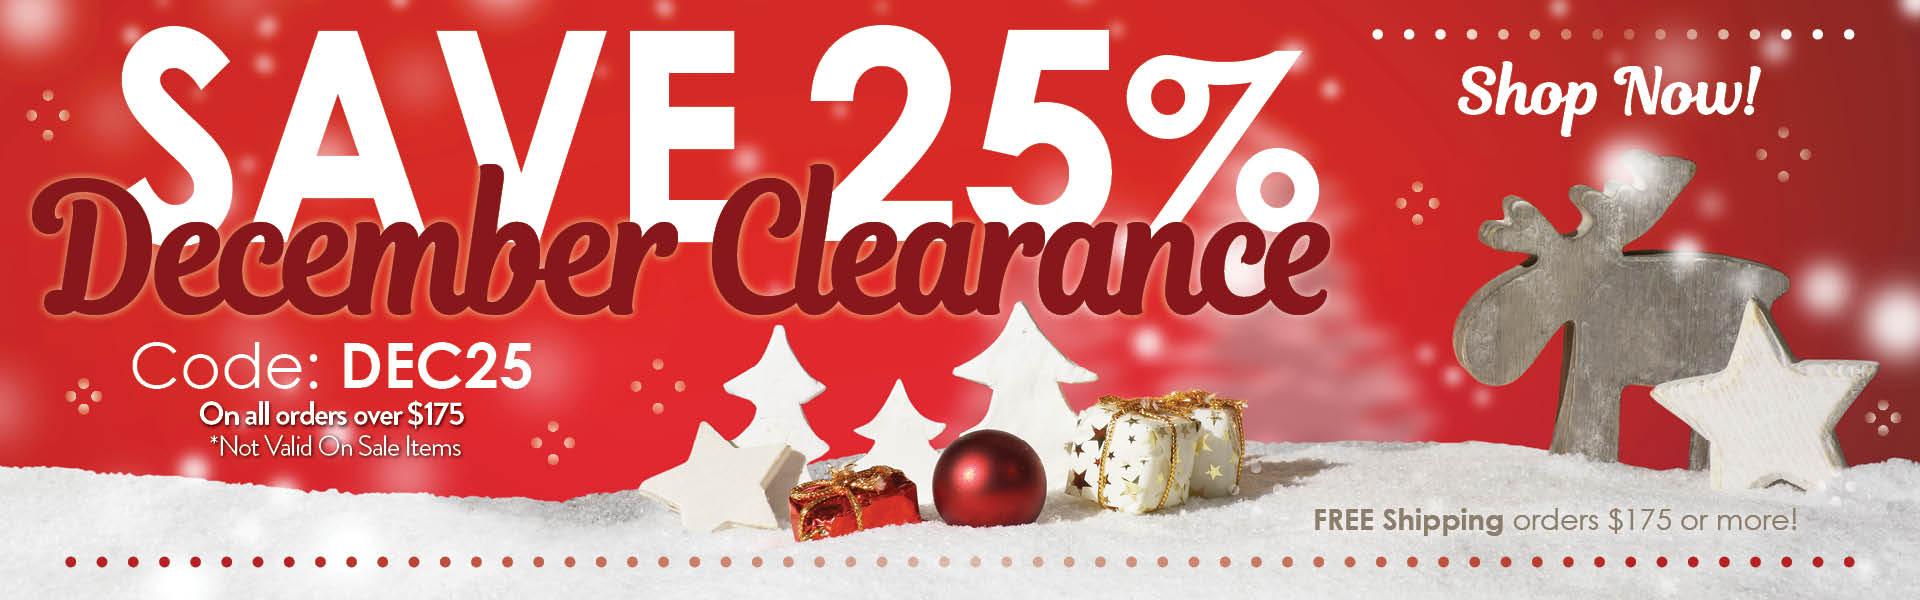 Shop Now! Save 25% December Clearance. Code: DEC25